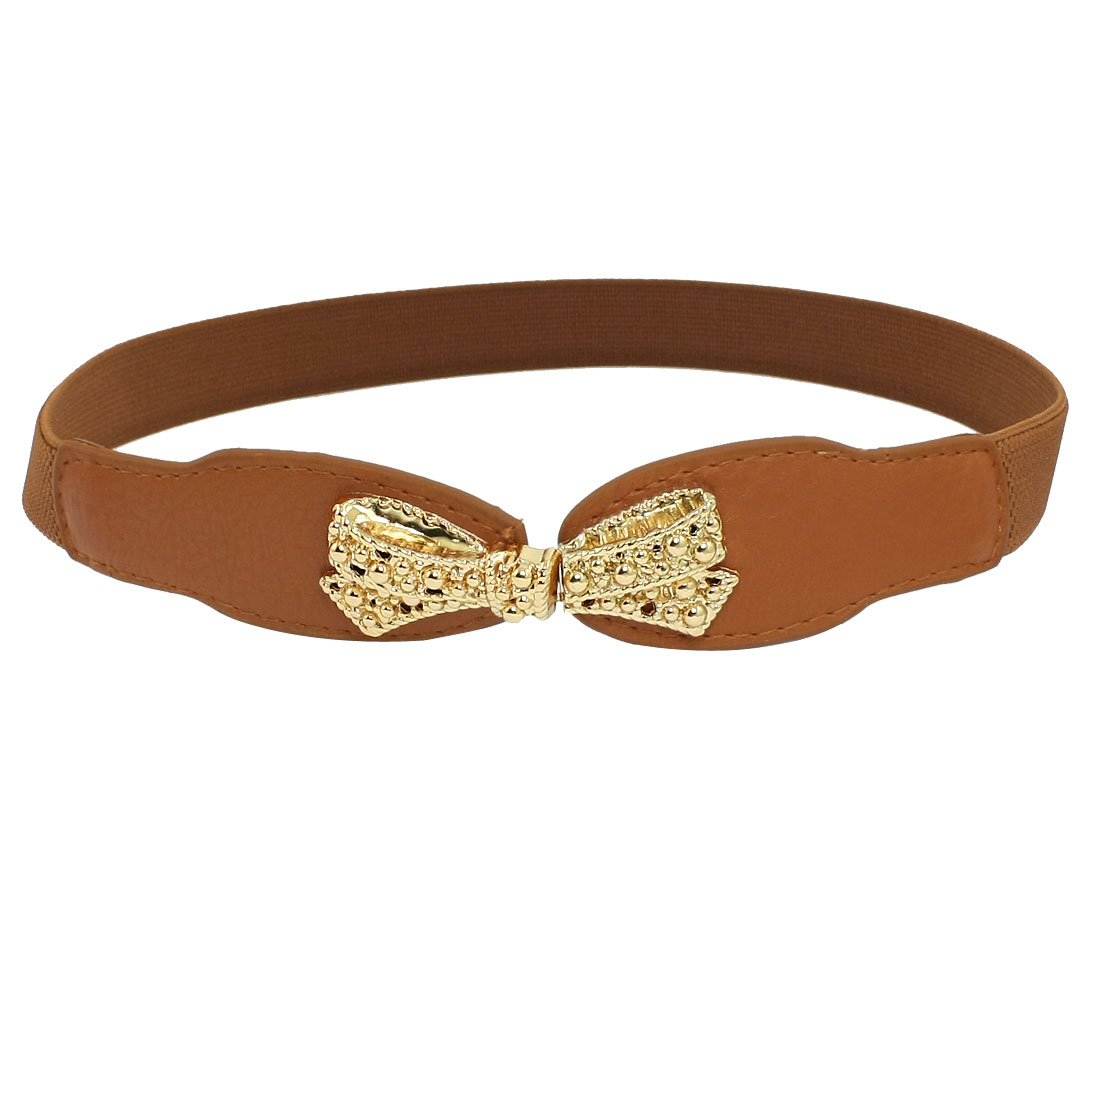 Lady Bowknot Style Interlocking Buckle Waist Belt Cinch Brown